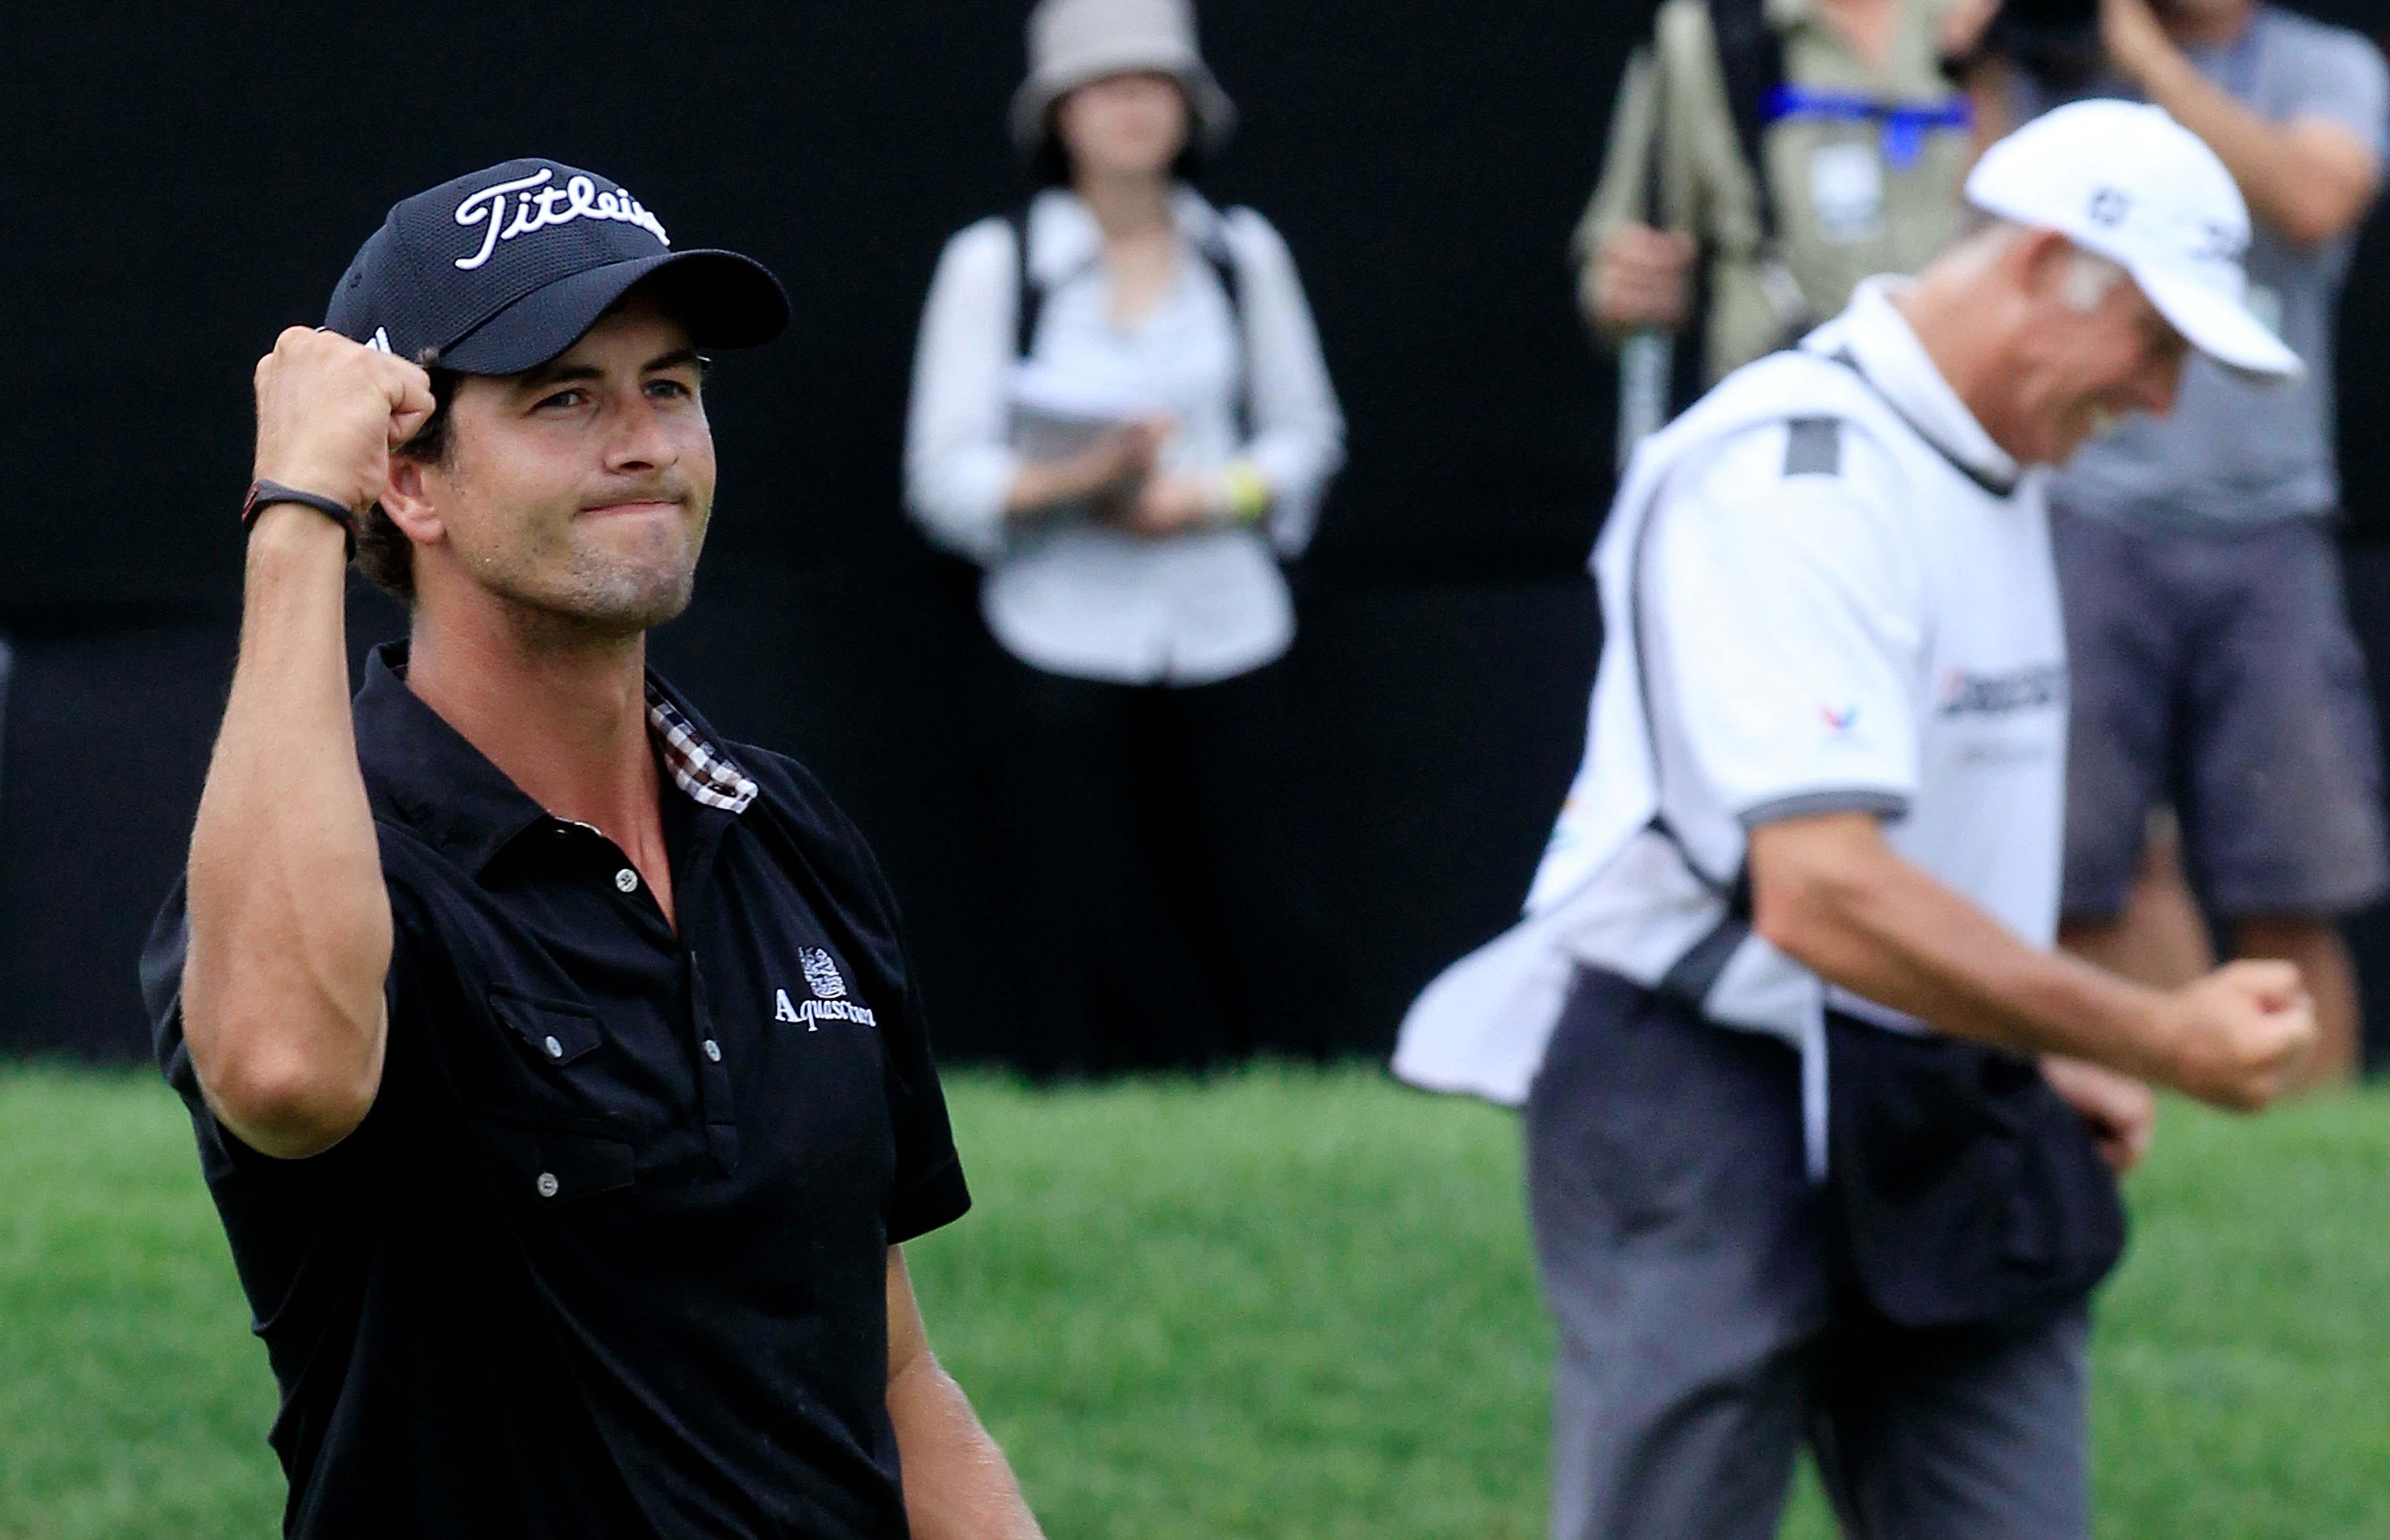 2. 2011: Scott wins, Williams yaps